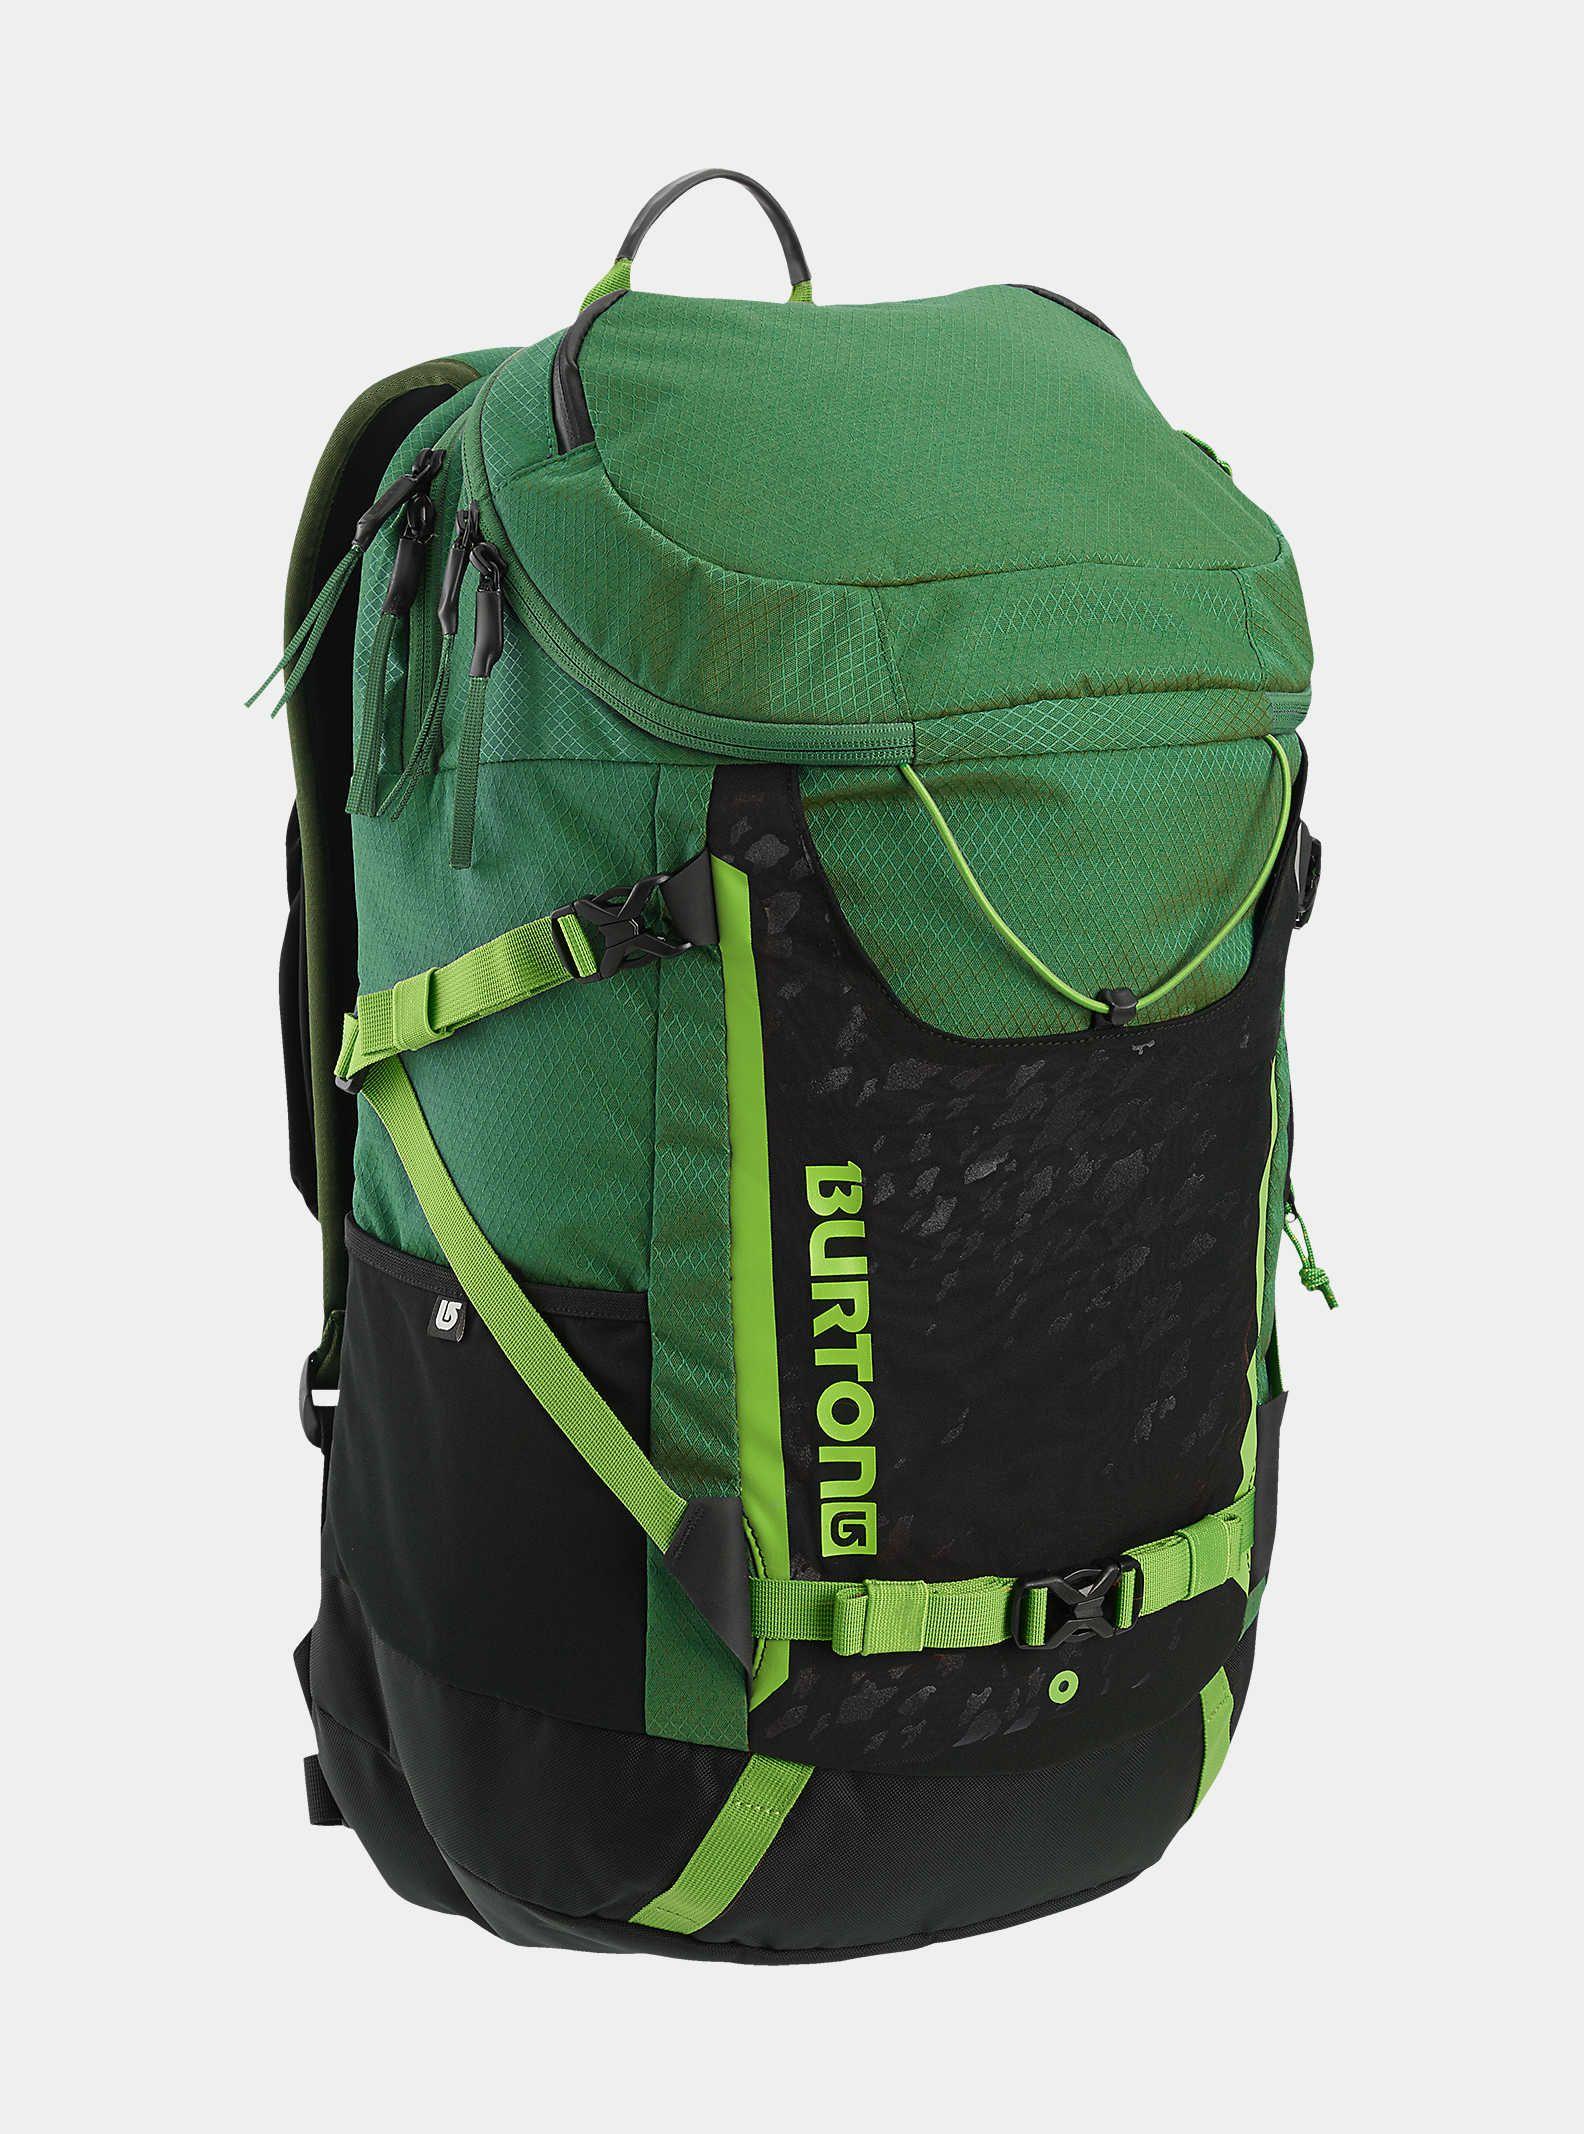 3deb9099f87 Burton Day Hiker Supreme 32L Backpack   Pinterest   Products